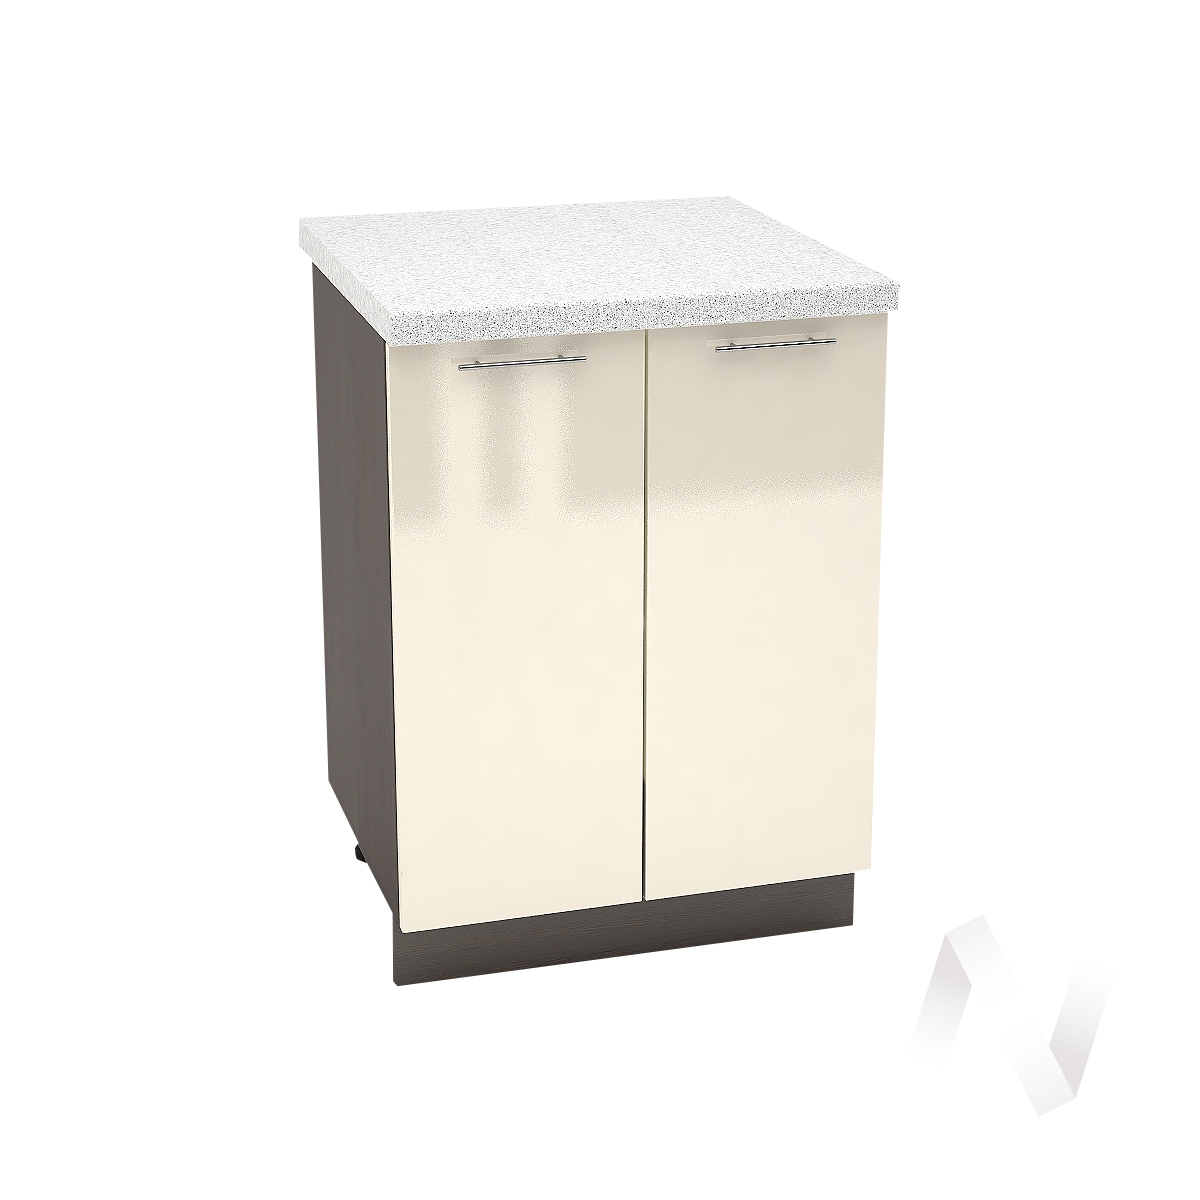 "Кухня ""Валерия-М"": Шкаф нижний 600, ШН 600 (Ваниль глянец/корпус венге)"